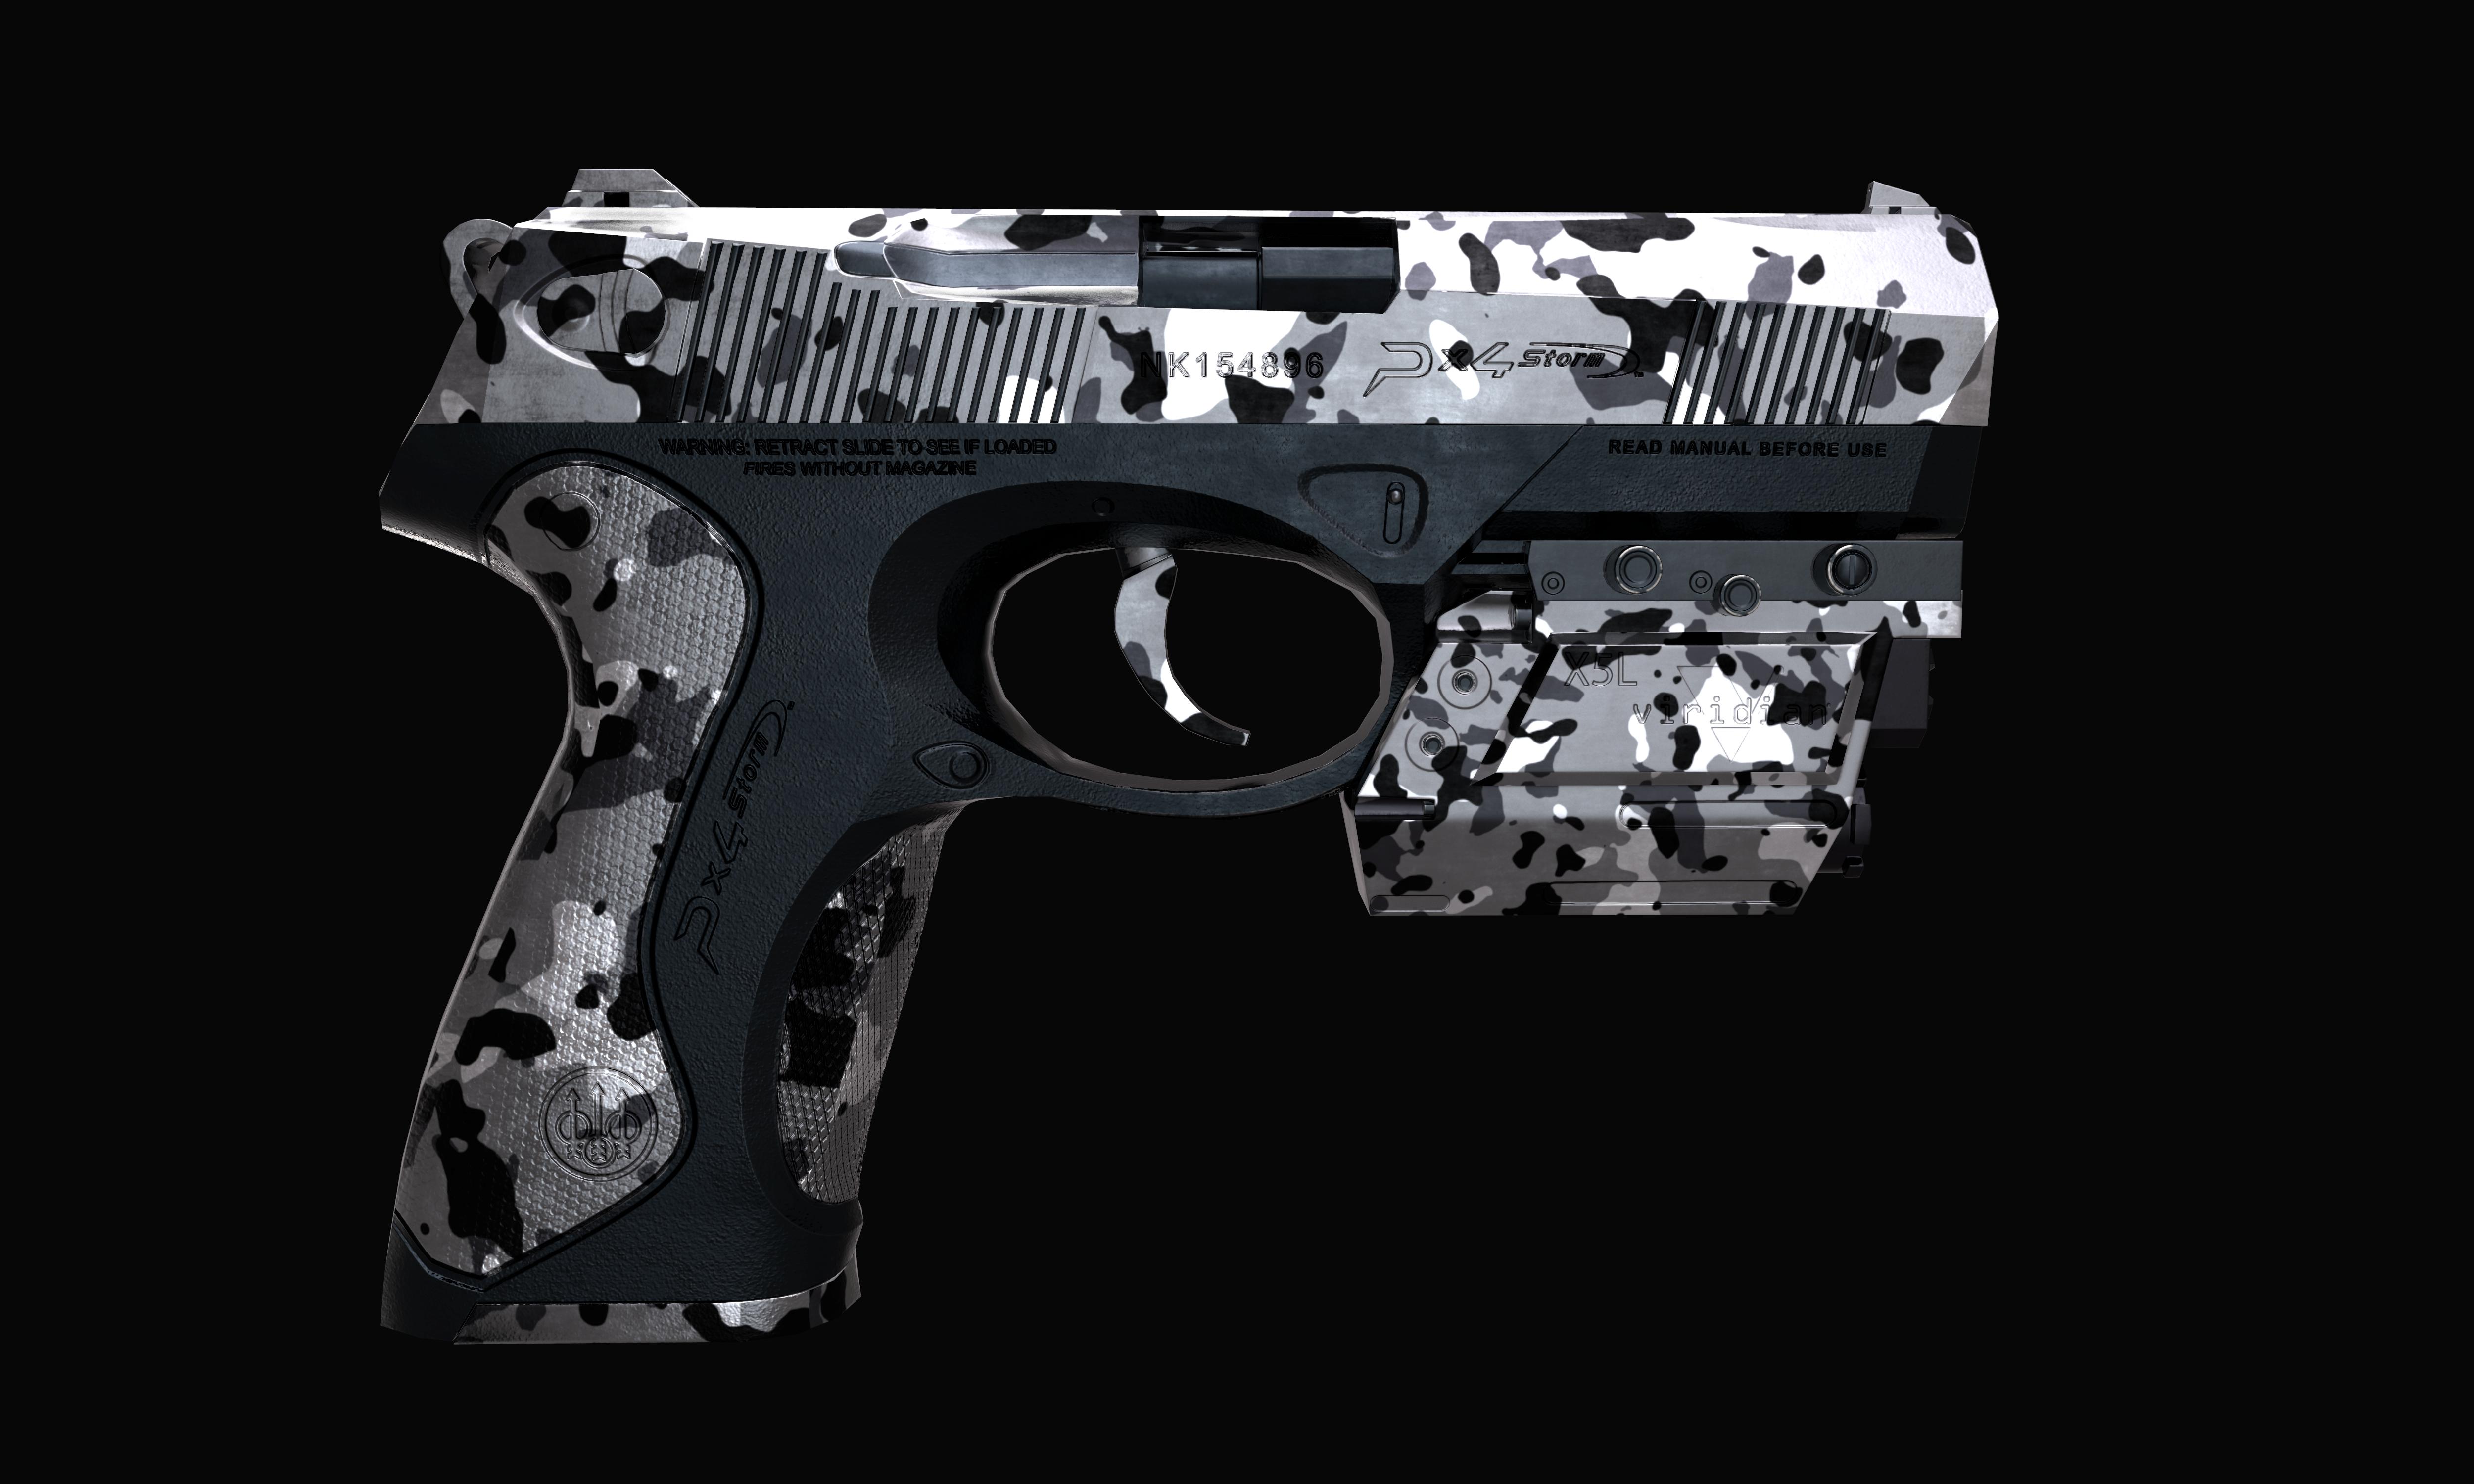 PX4 Storm - Pistol